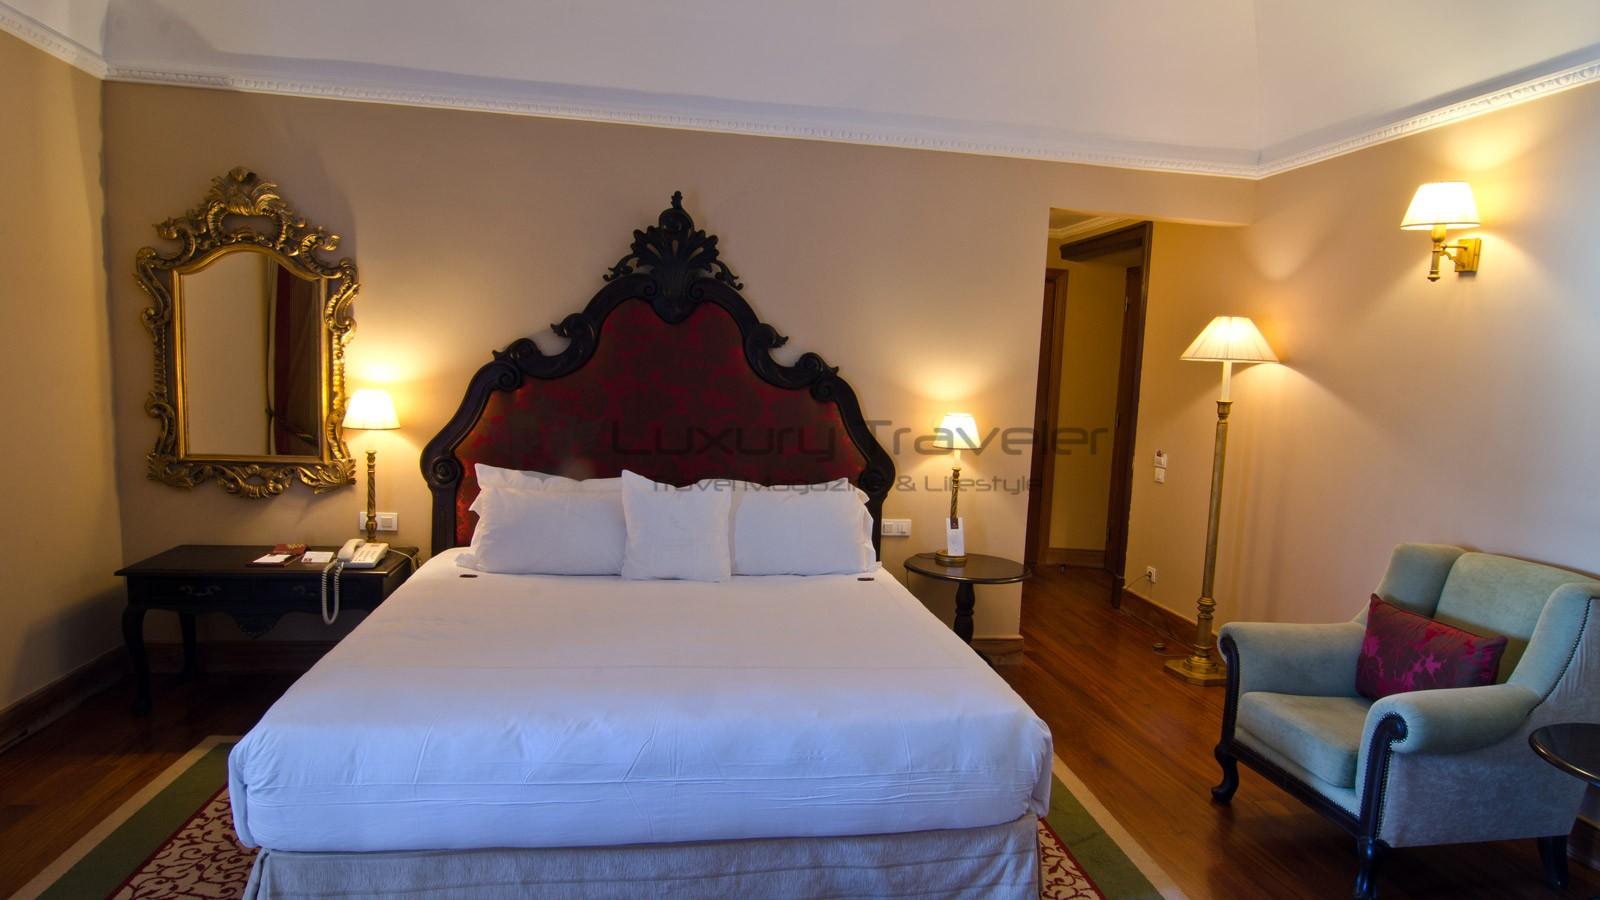 Convento_Espinheiro_Hotel_Evora_Starwood_Heritage_Room